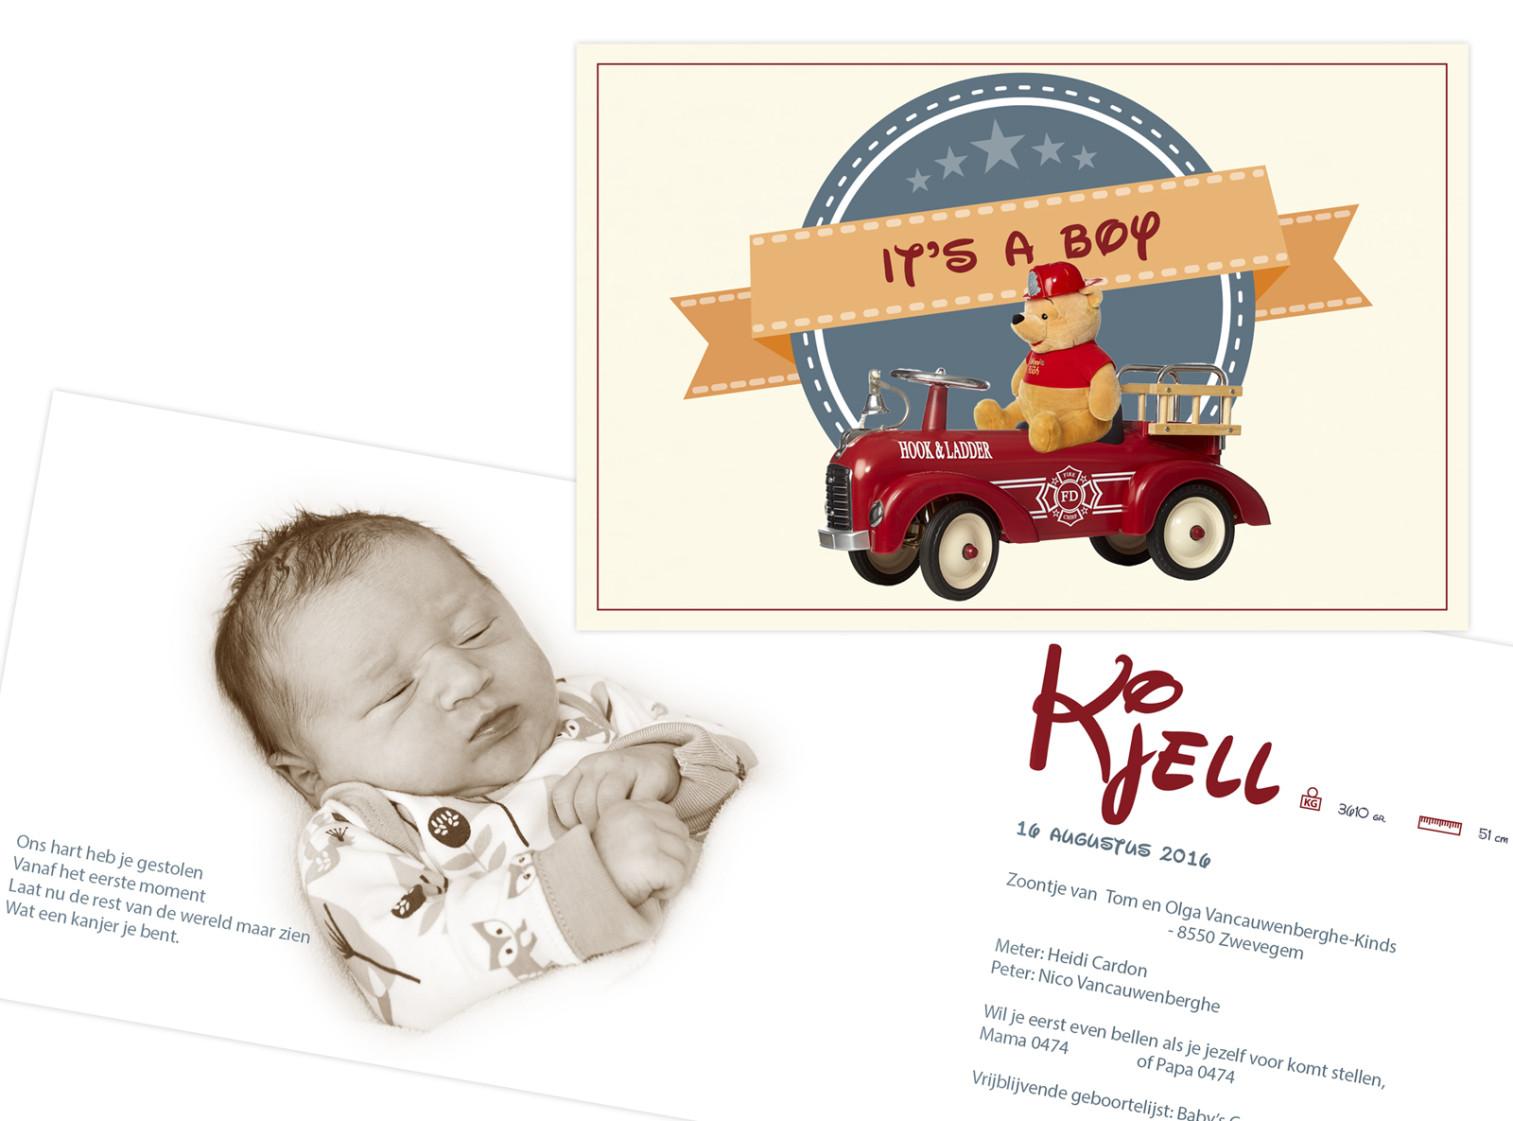 Geboortekaartje met foto van Kjell